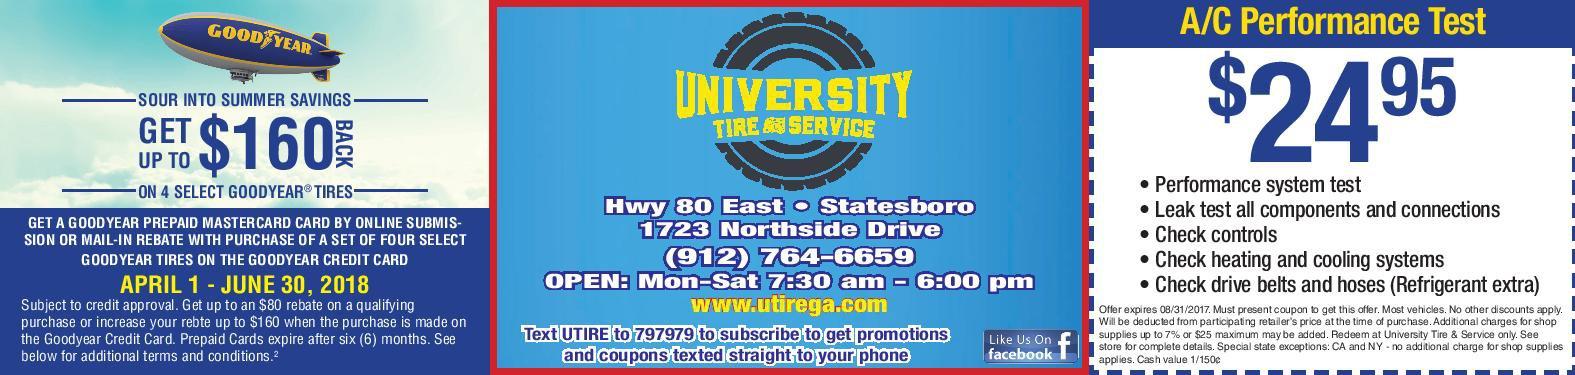 University Tire Image